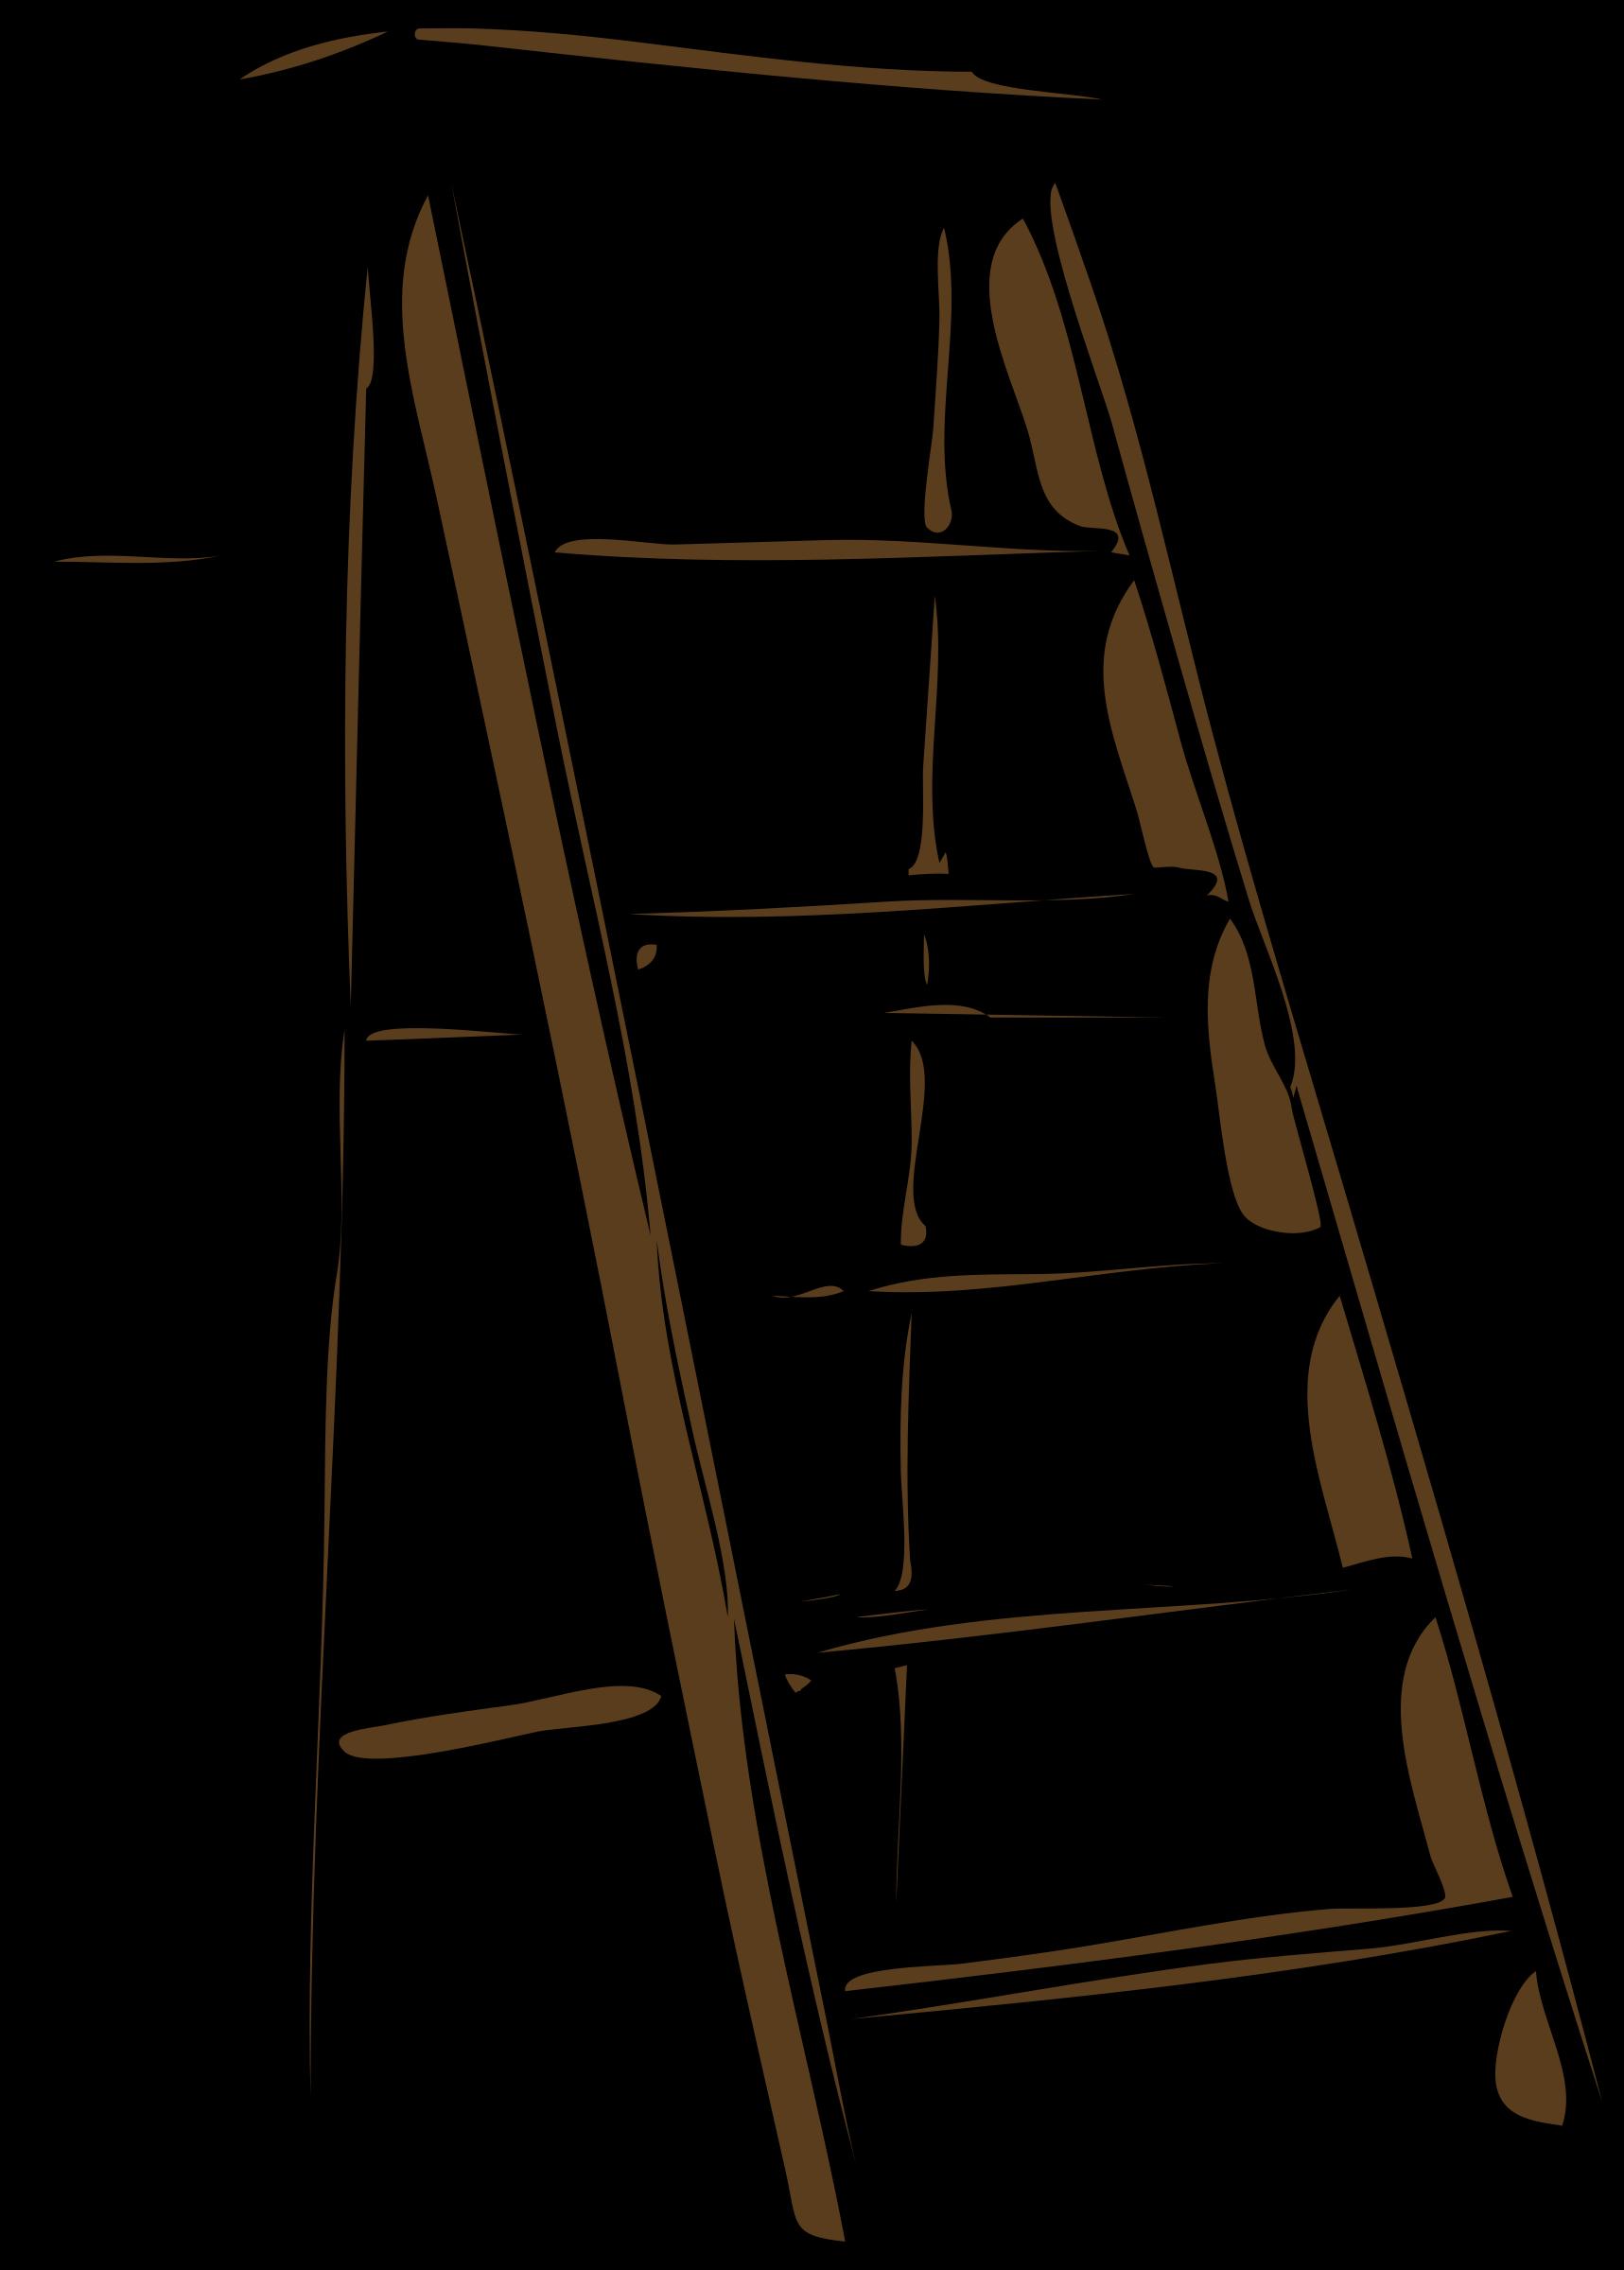 Rchitetto scala doppia big. Ladder clipart step stool